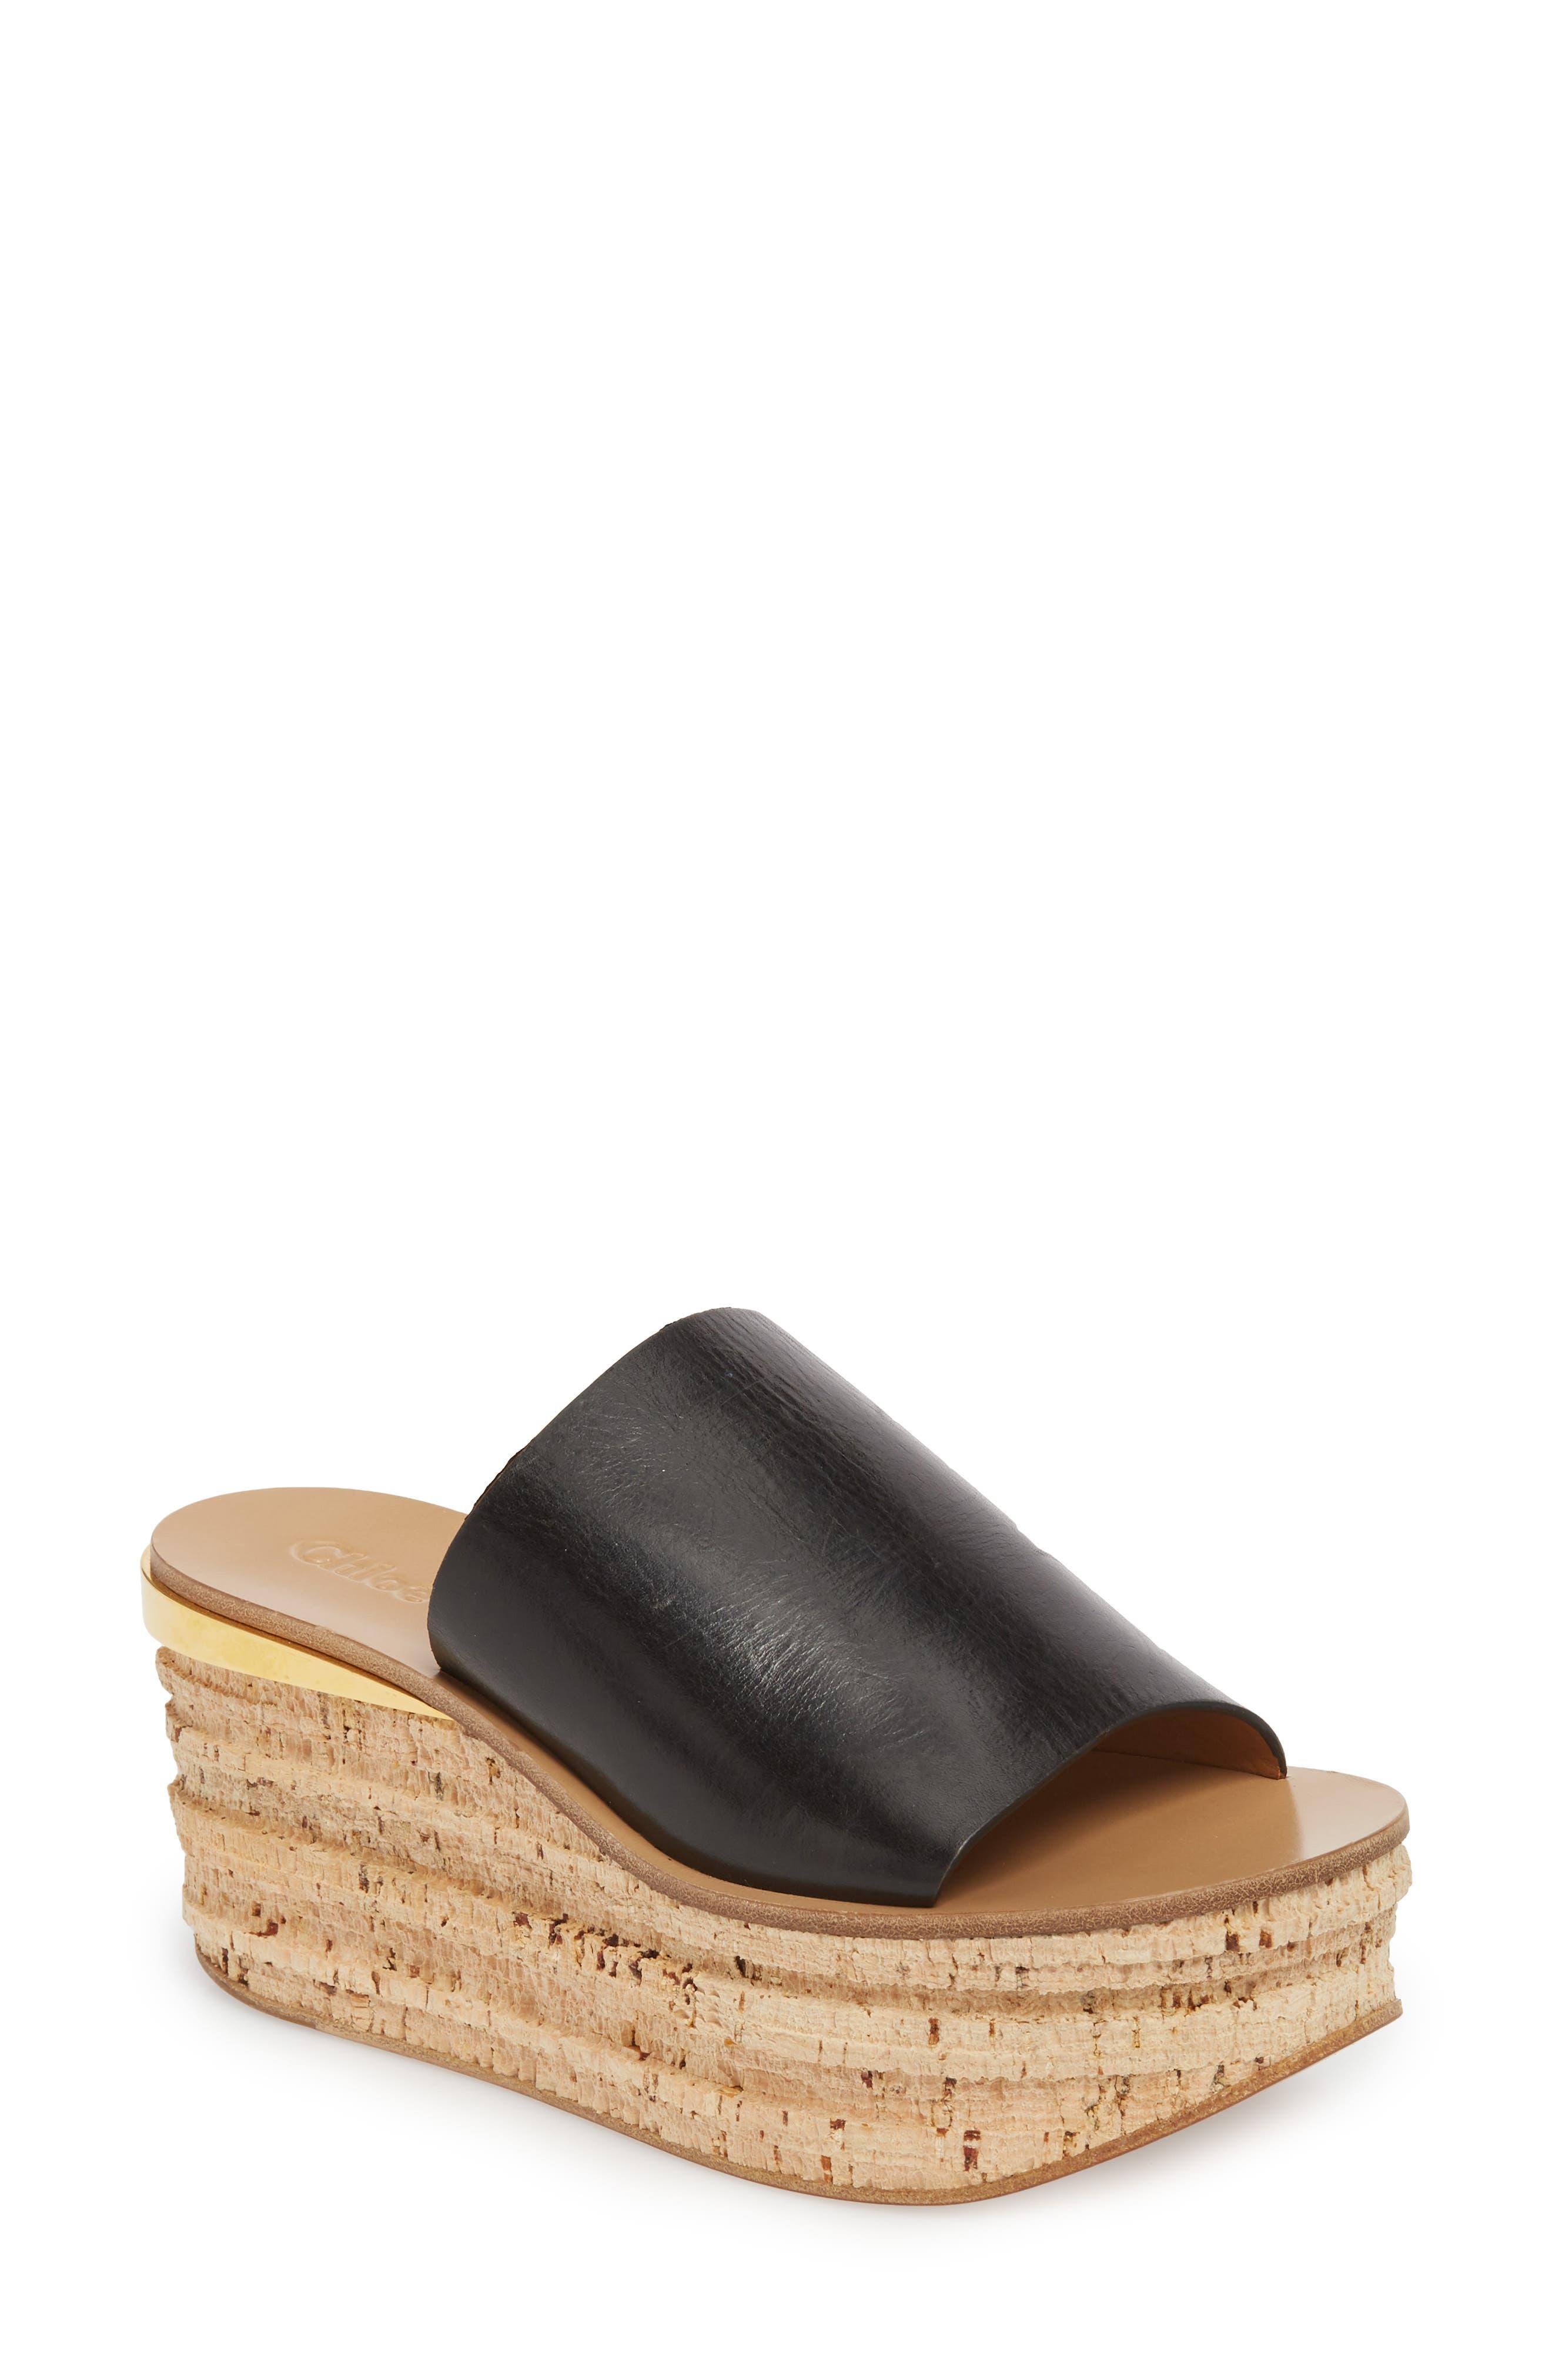 Camille Cork Platform Sandal,                             Main thumbnail 1, color,                             Black